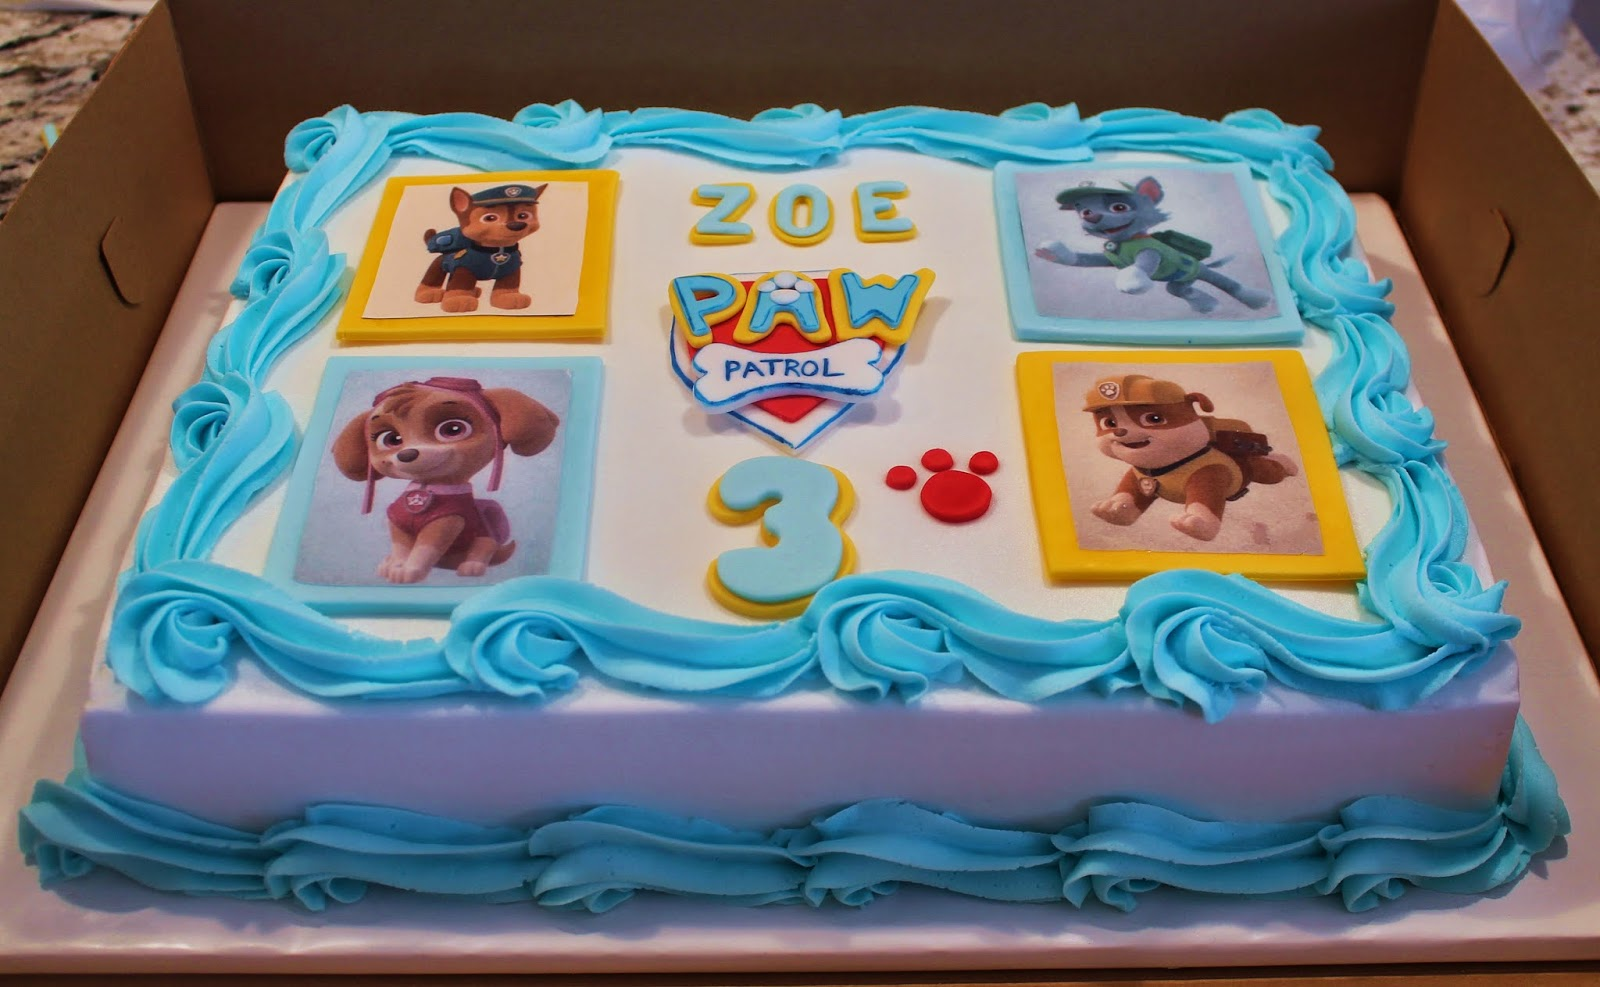 Creative Cakes By Lynn Paw Patrol Sheet Cake